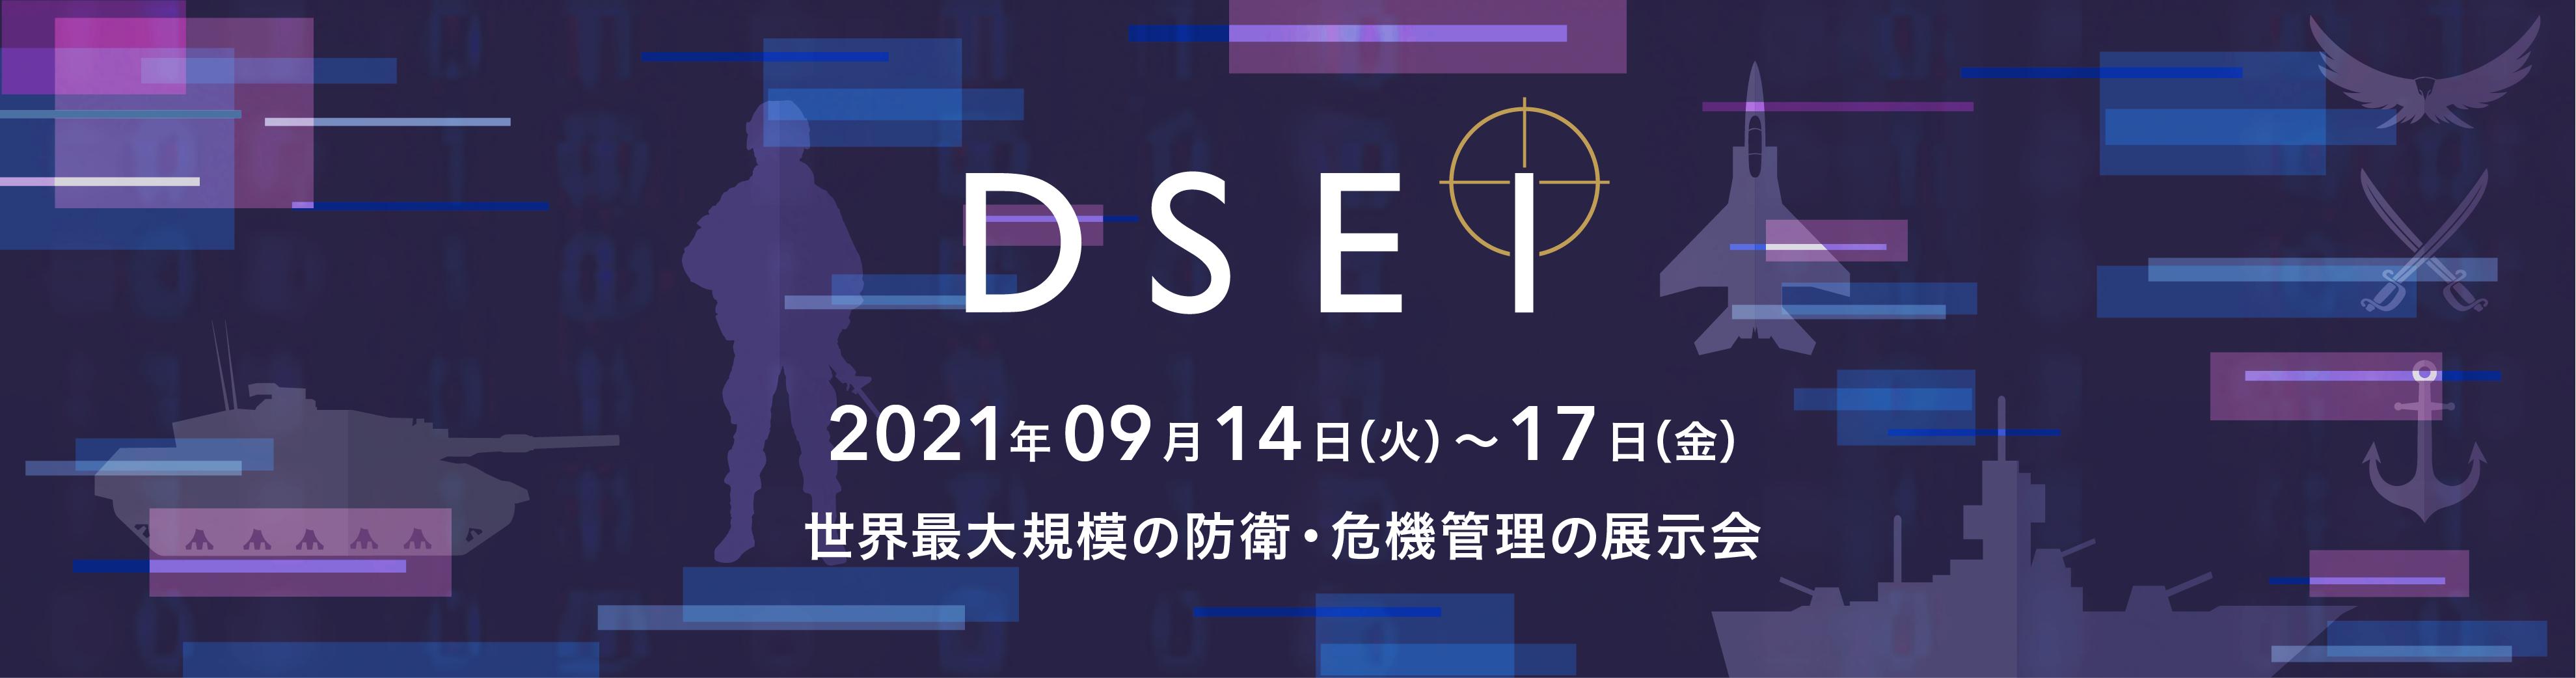 DSEI2021